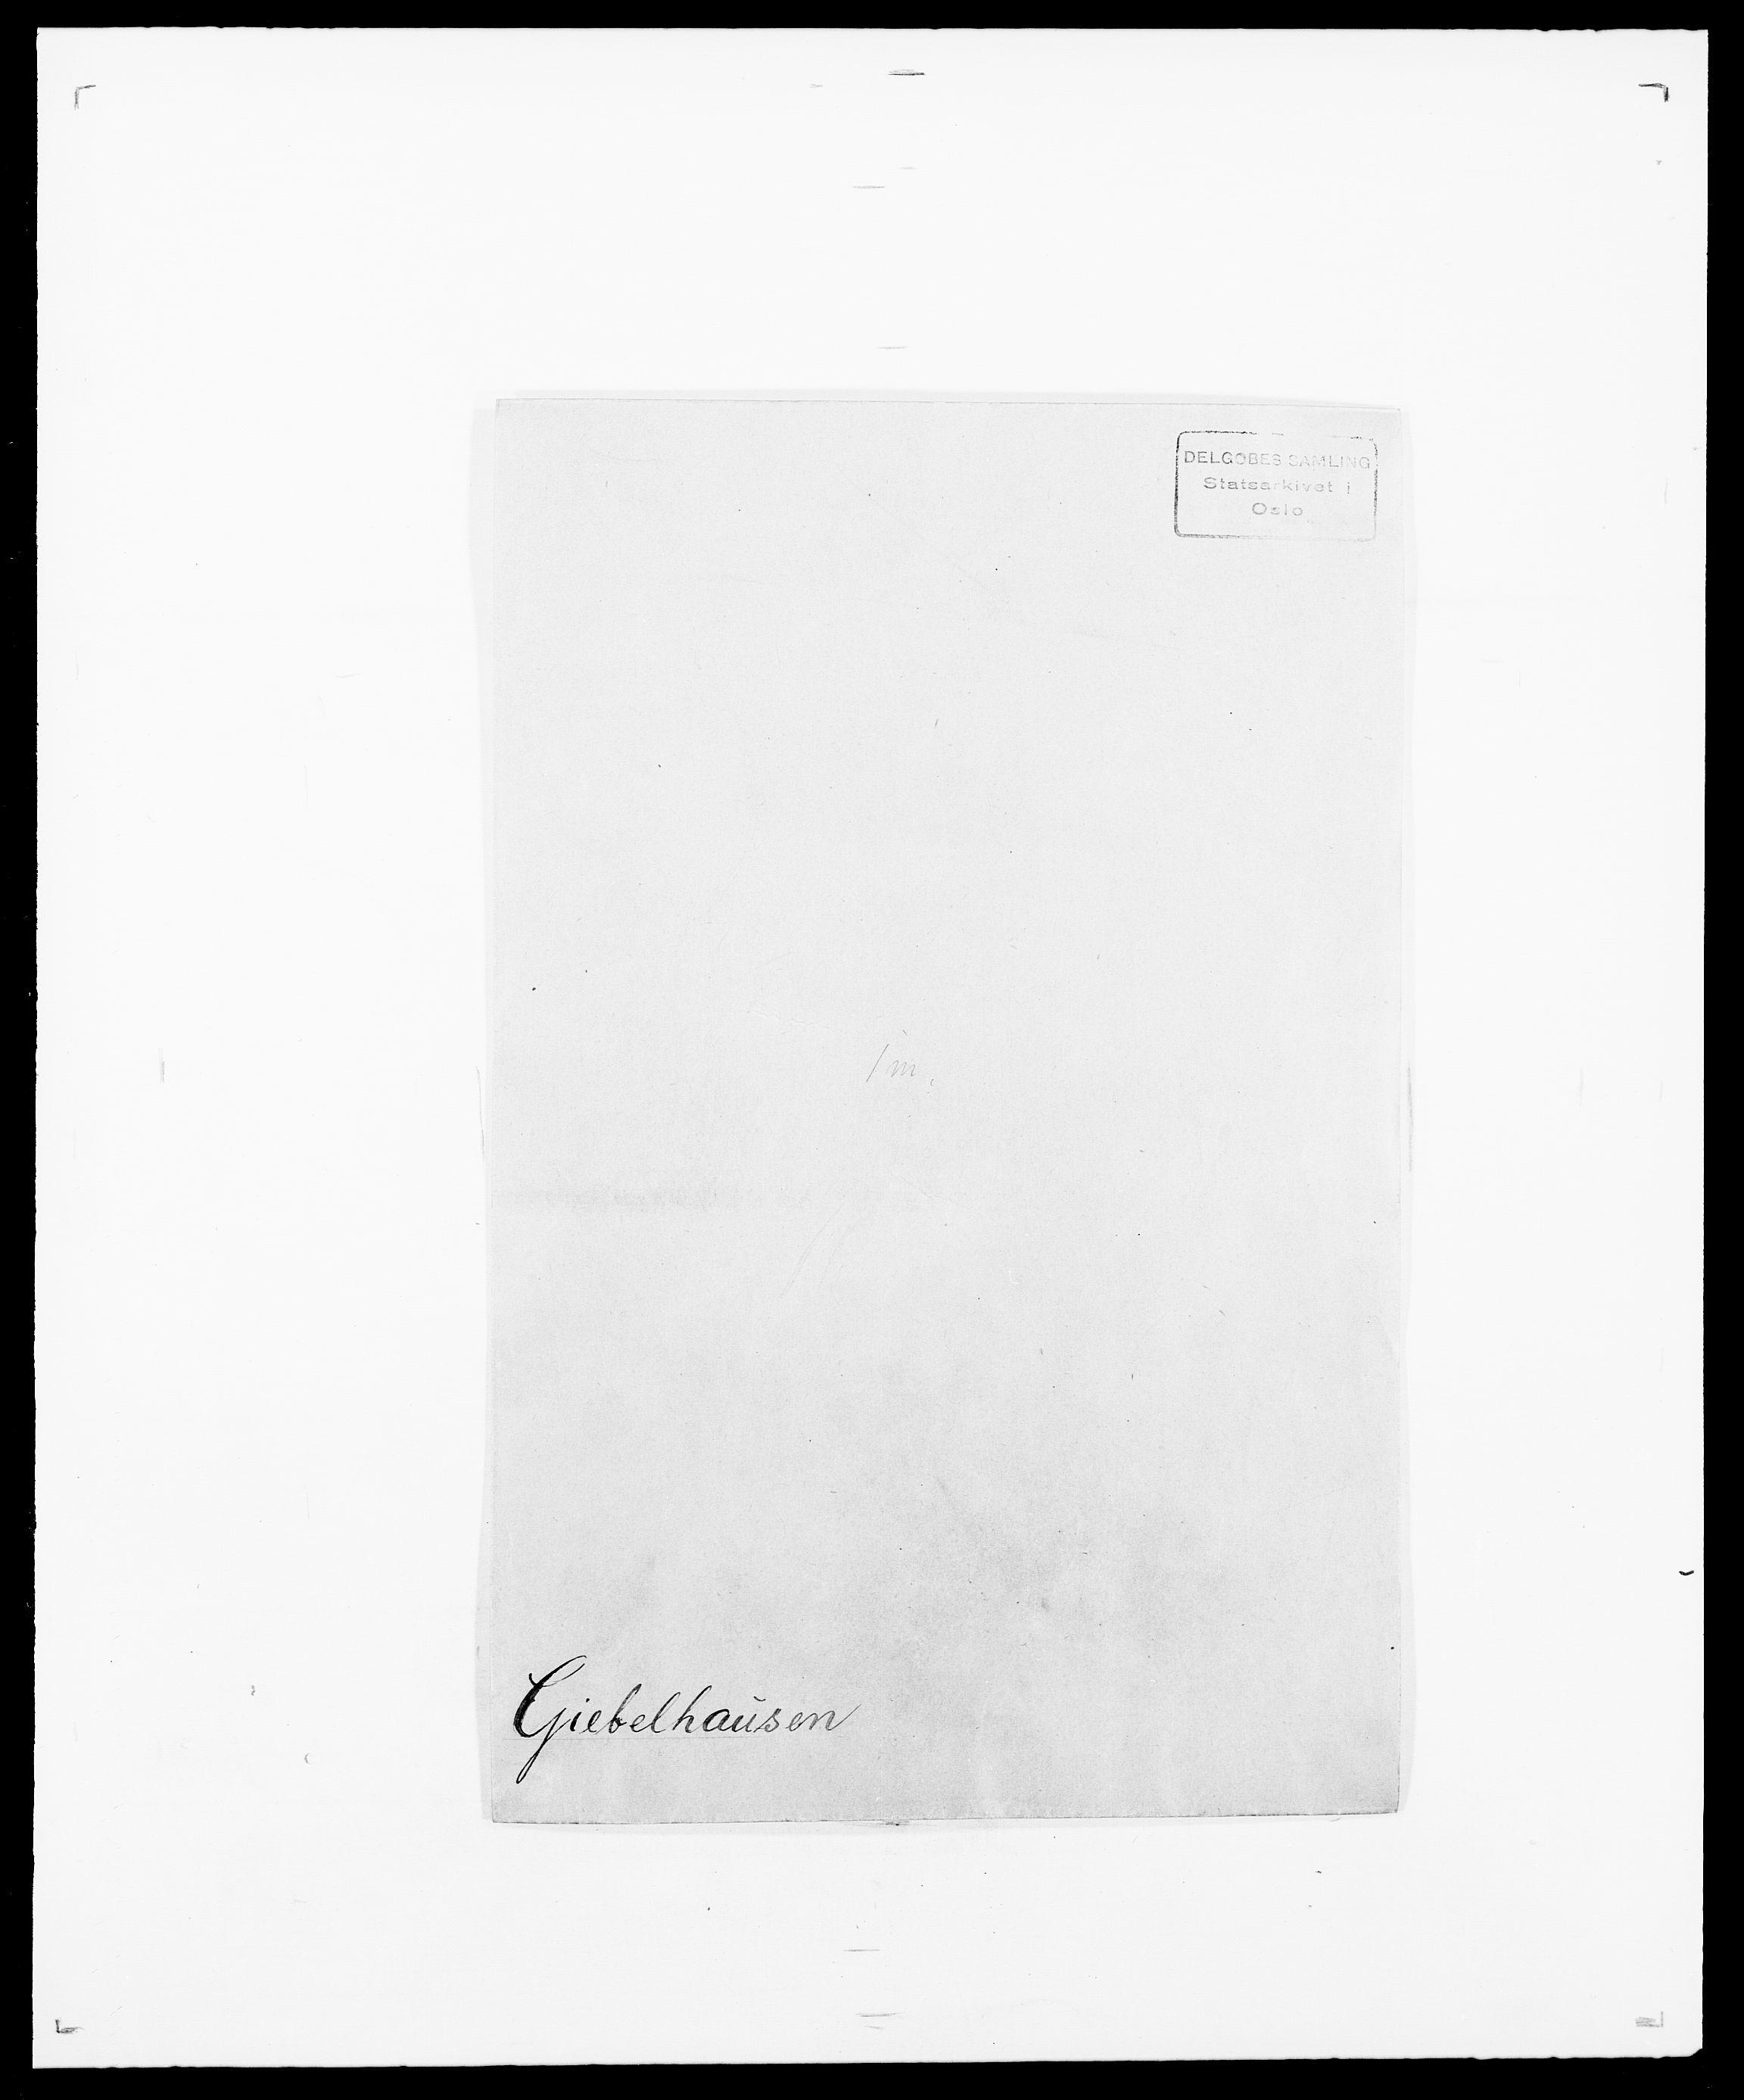 SAO, Delgobe, Charles Antoine - samling, D/Da/L0014: Giebdhausen - Grip, s. 1